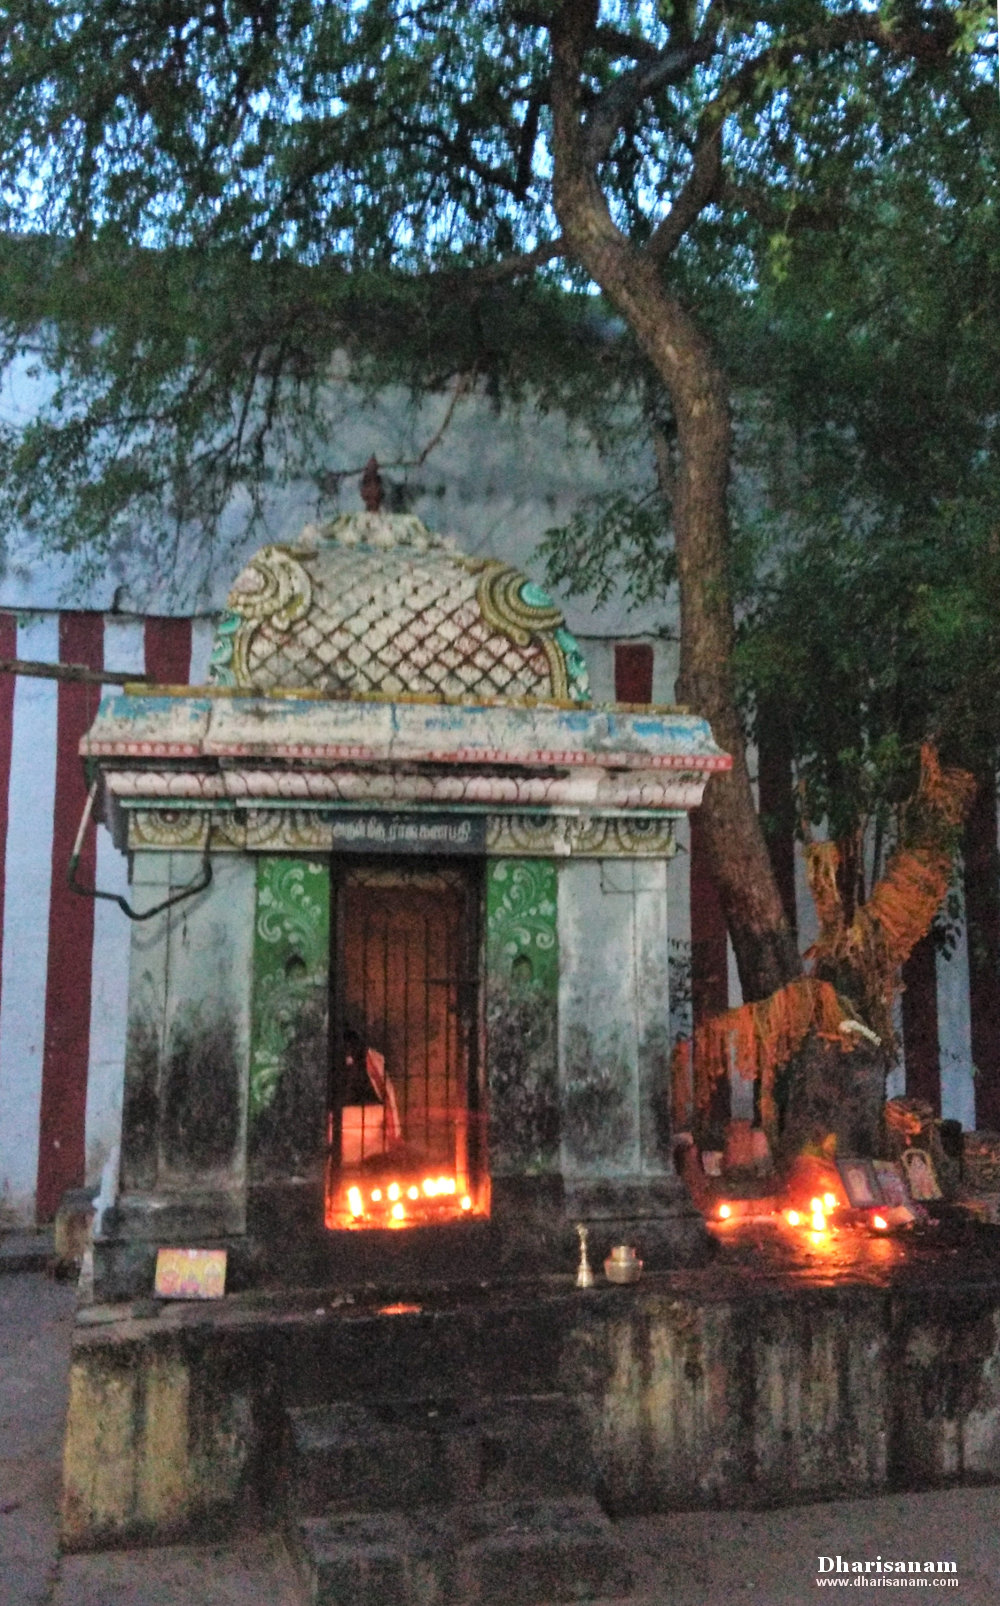 Yama dharma temple in bangalore dating